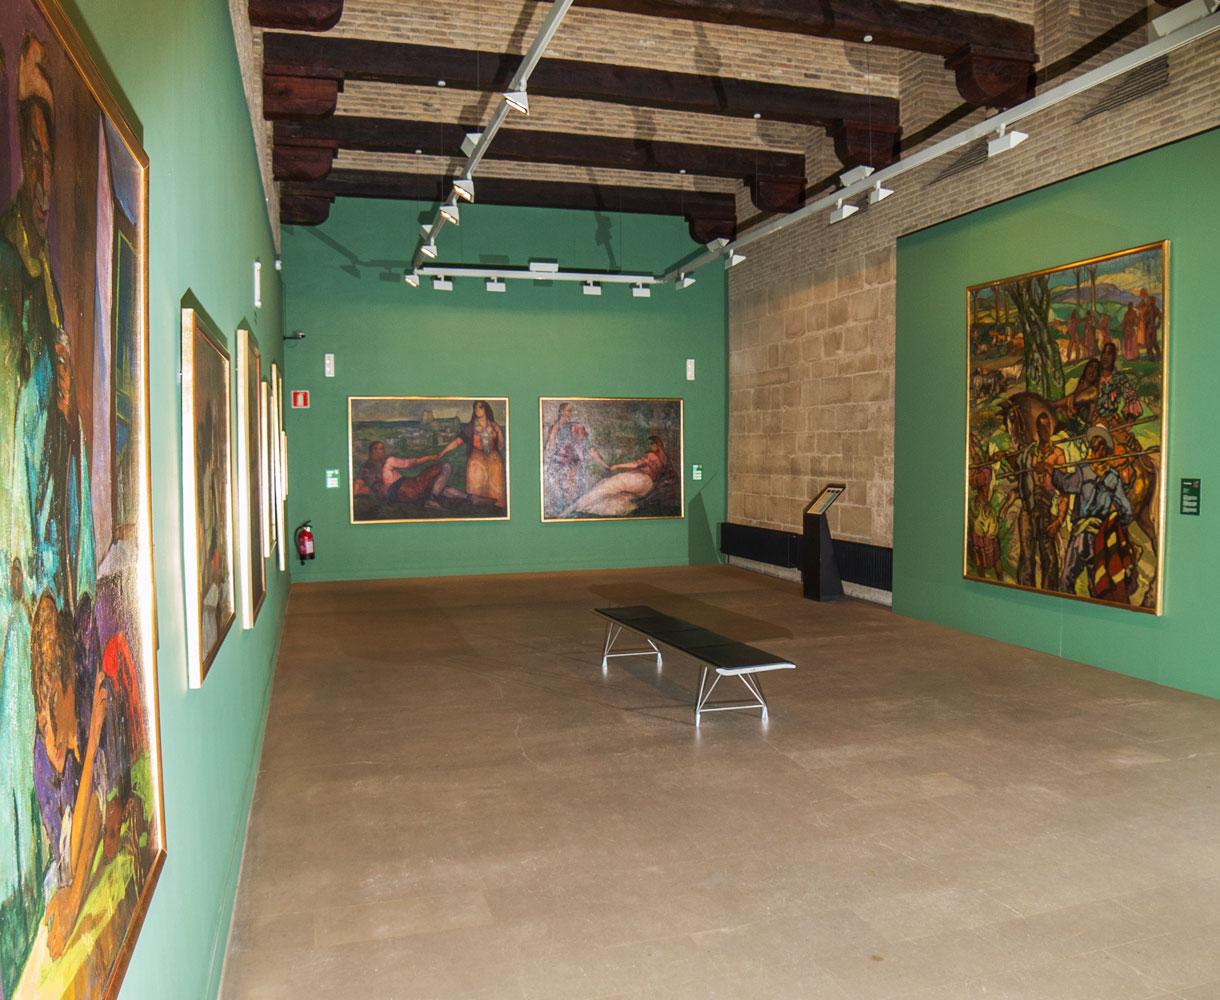 Sala 4 Museo Gustavo de Maeztu. Estella-Lizarra